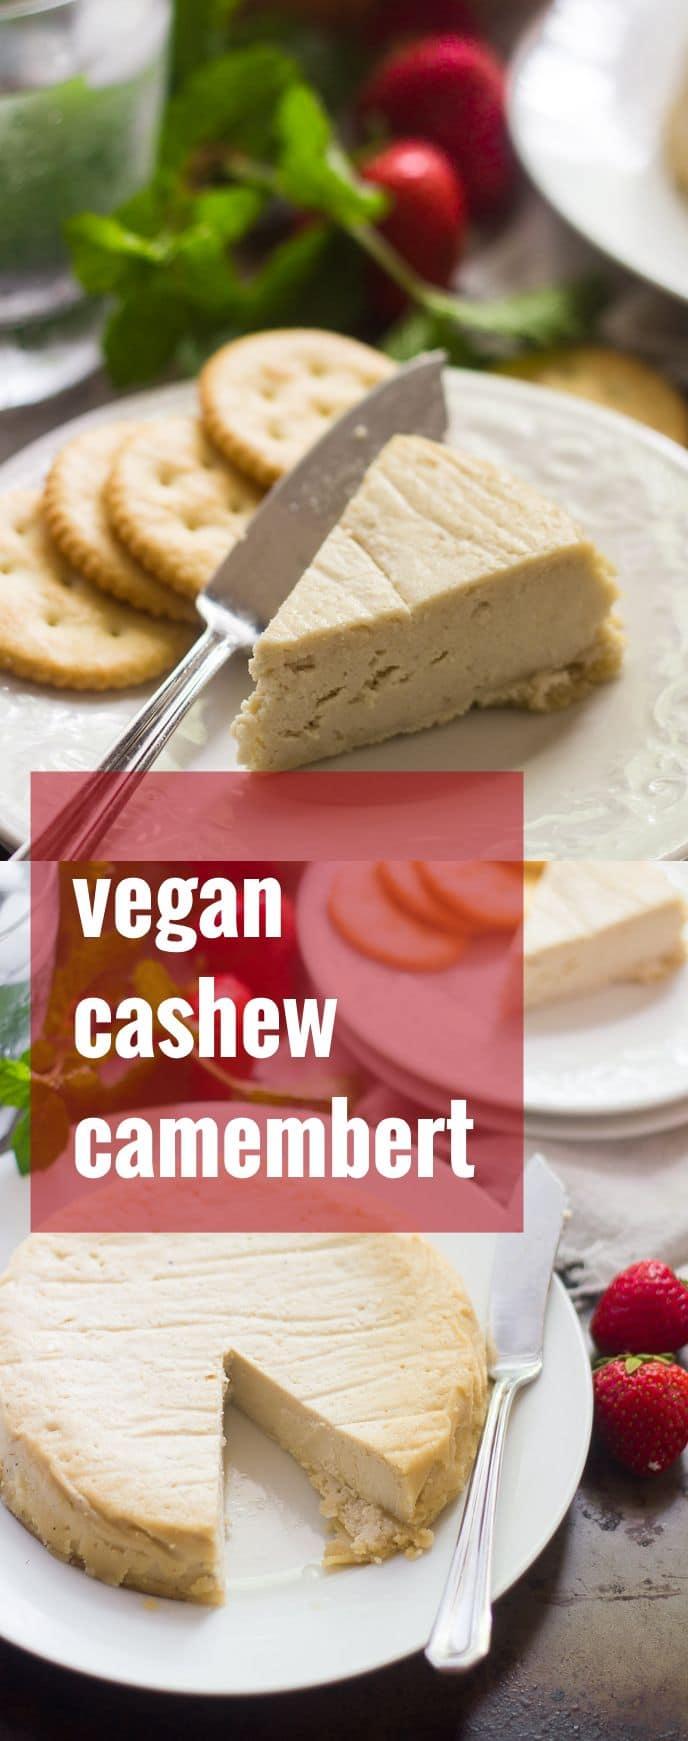 Cashew Camembert